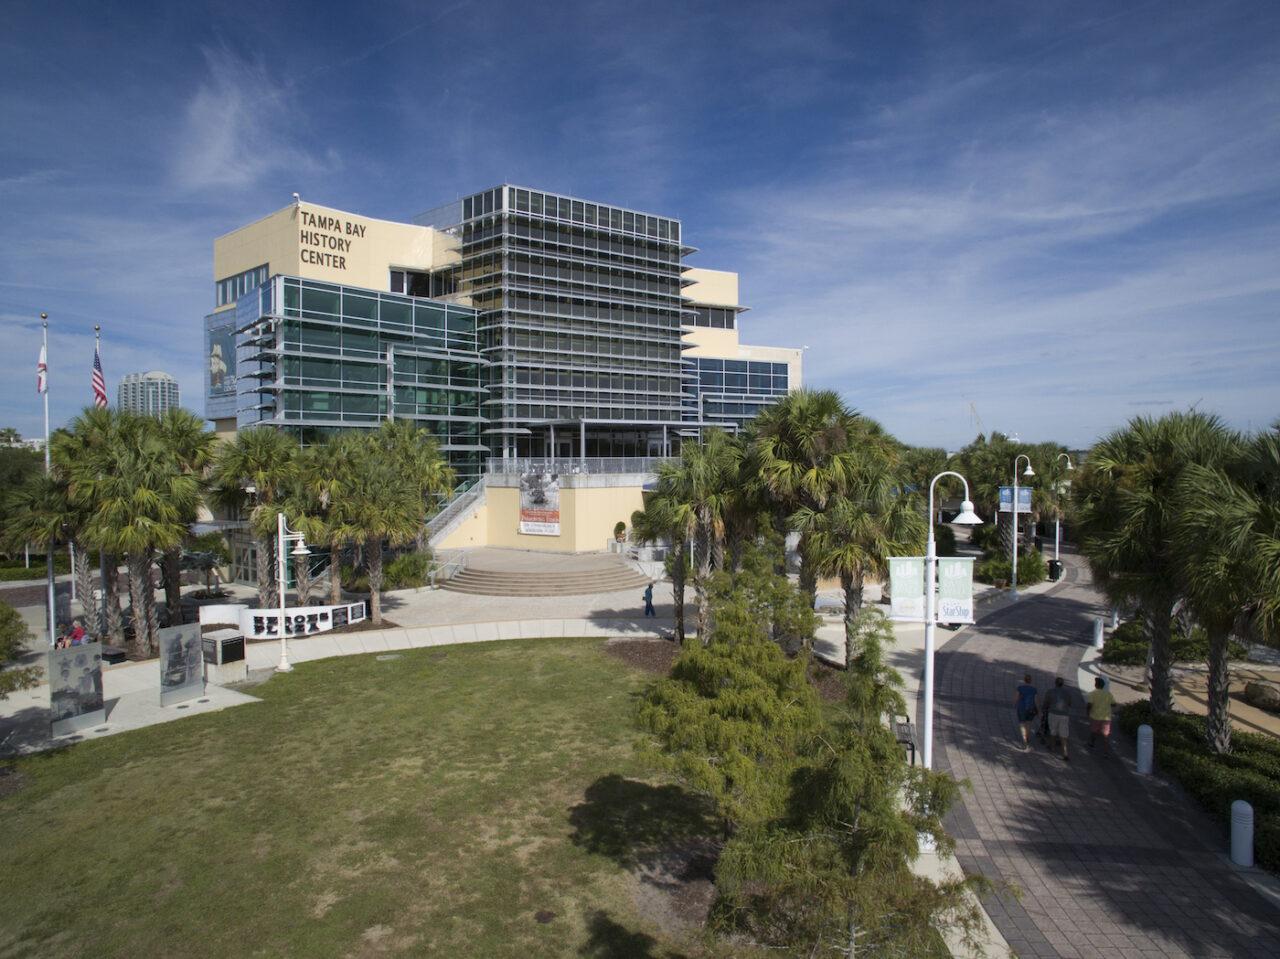 Tampa-Bay-History-Center-1280x959.jpeg